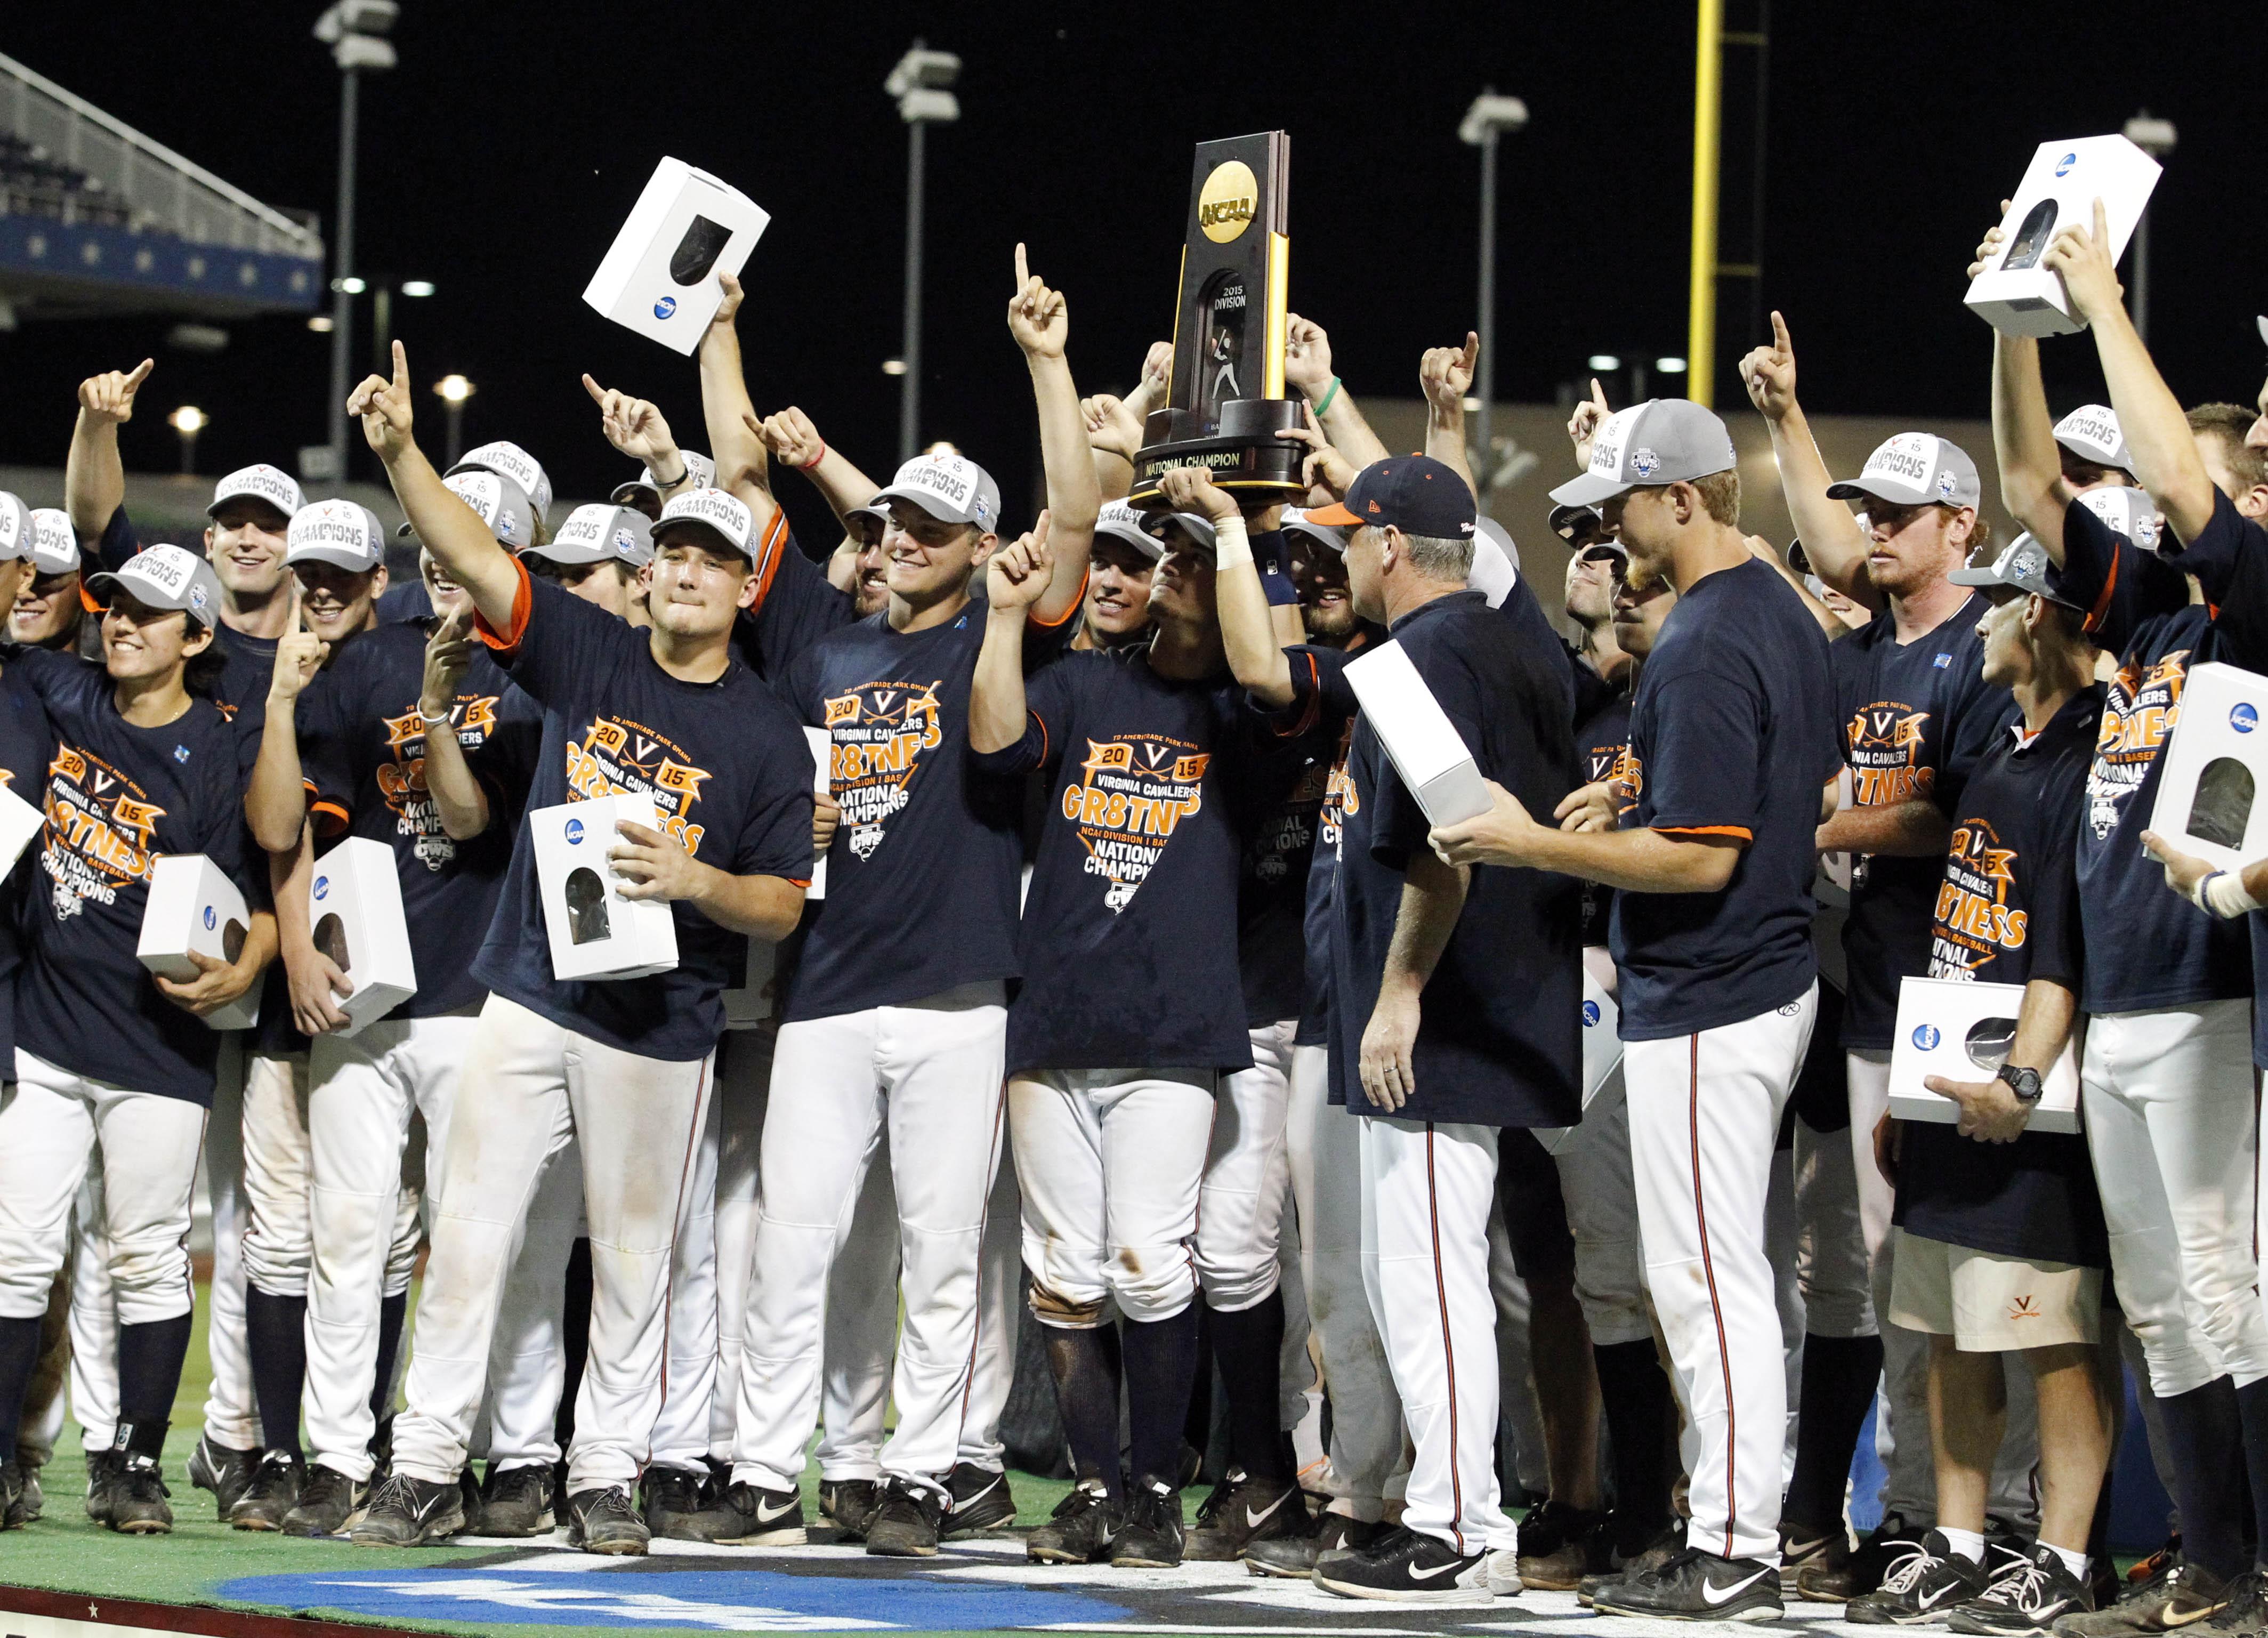 Virginia avenged last year's finals loss, beating Vanderbilt to win the 2015 College World Series.